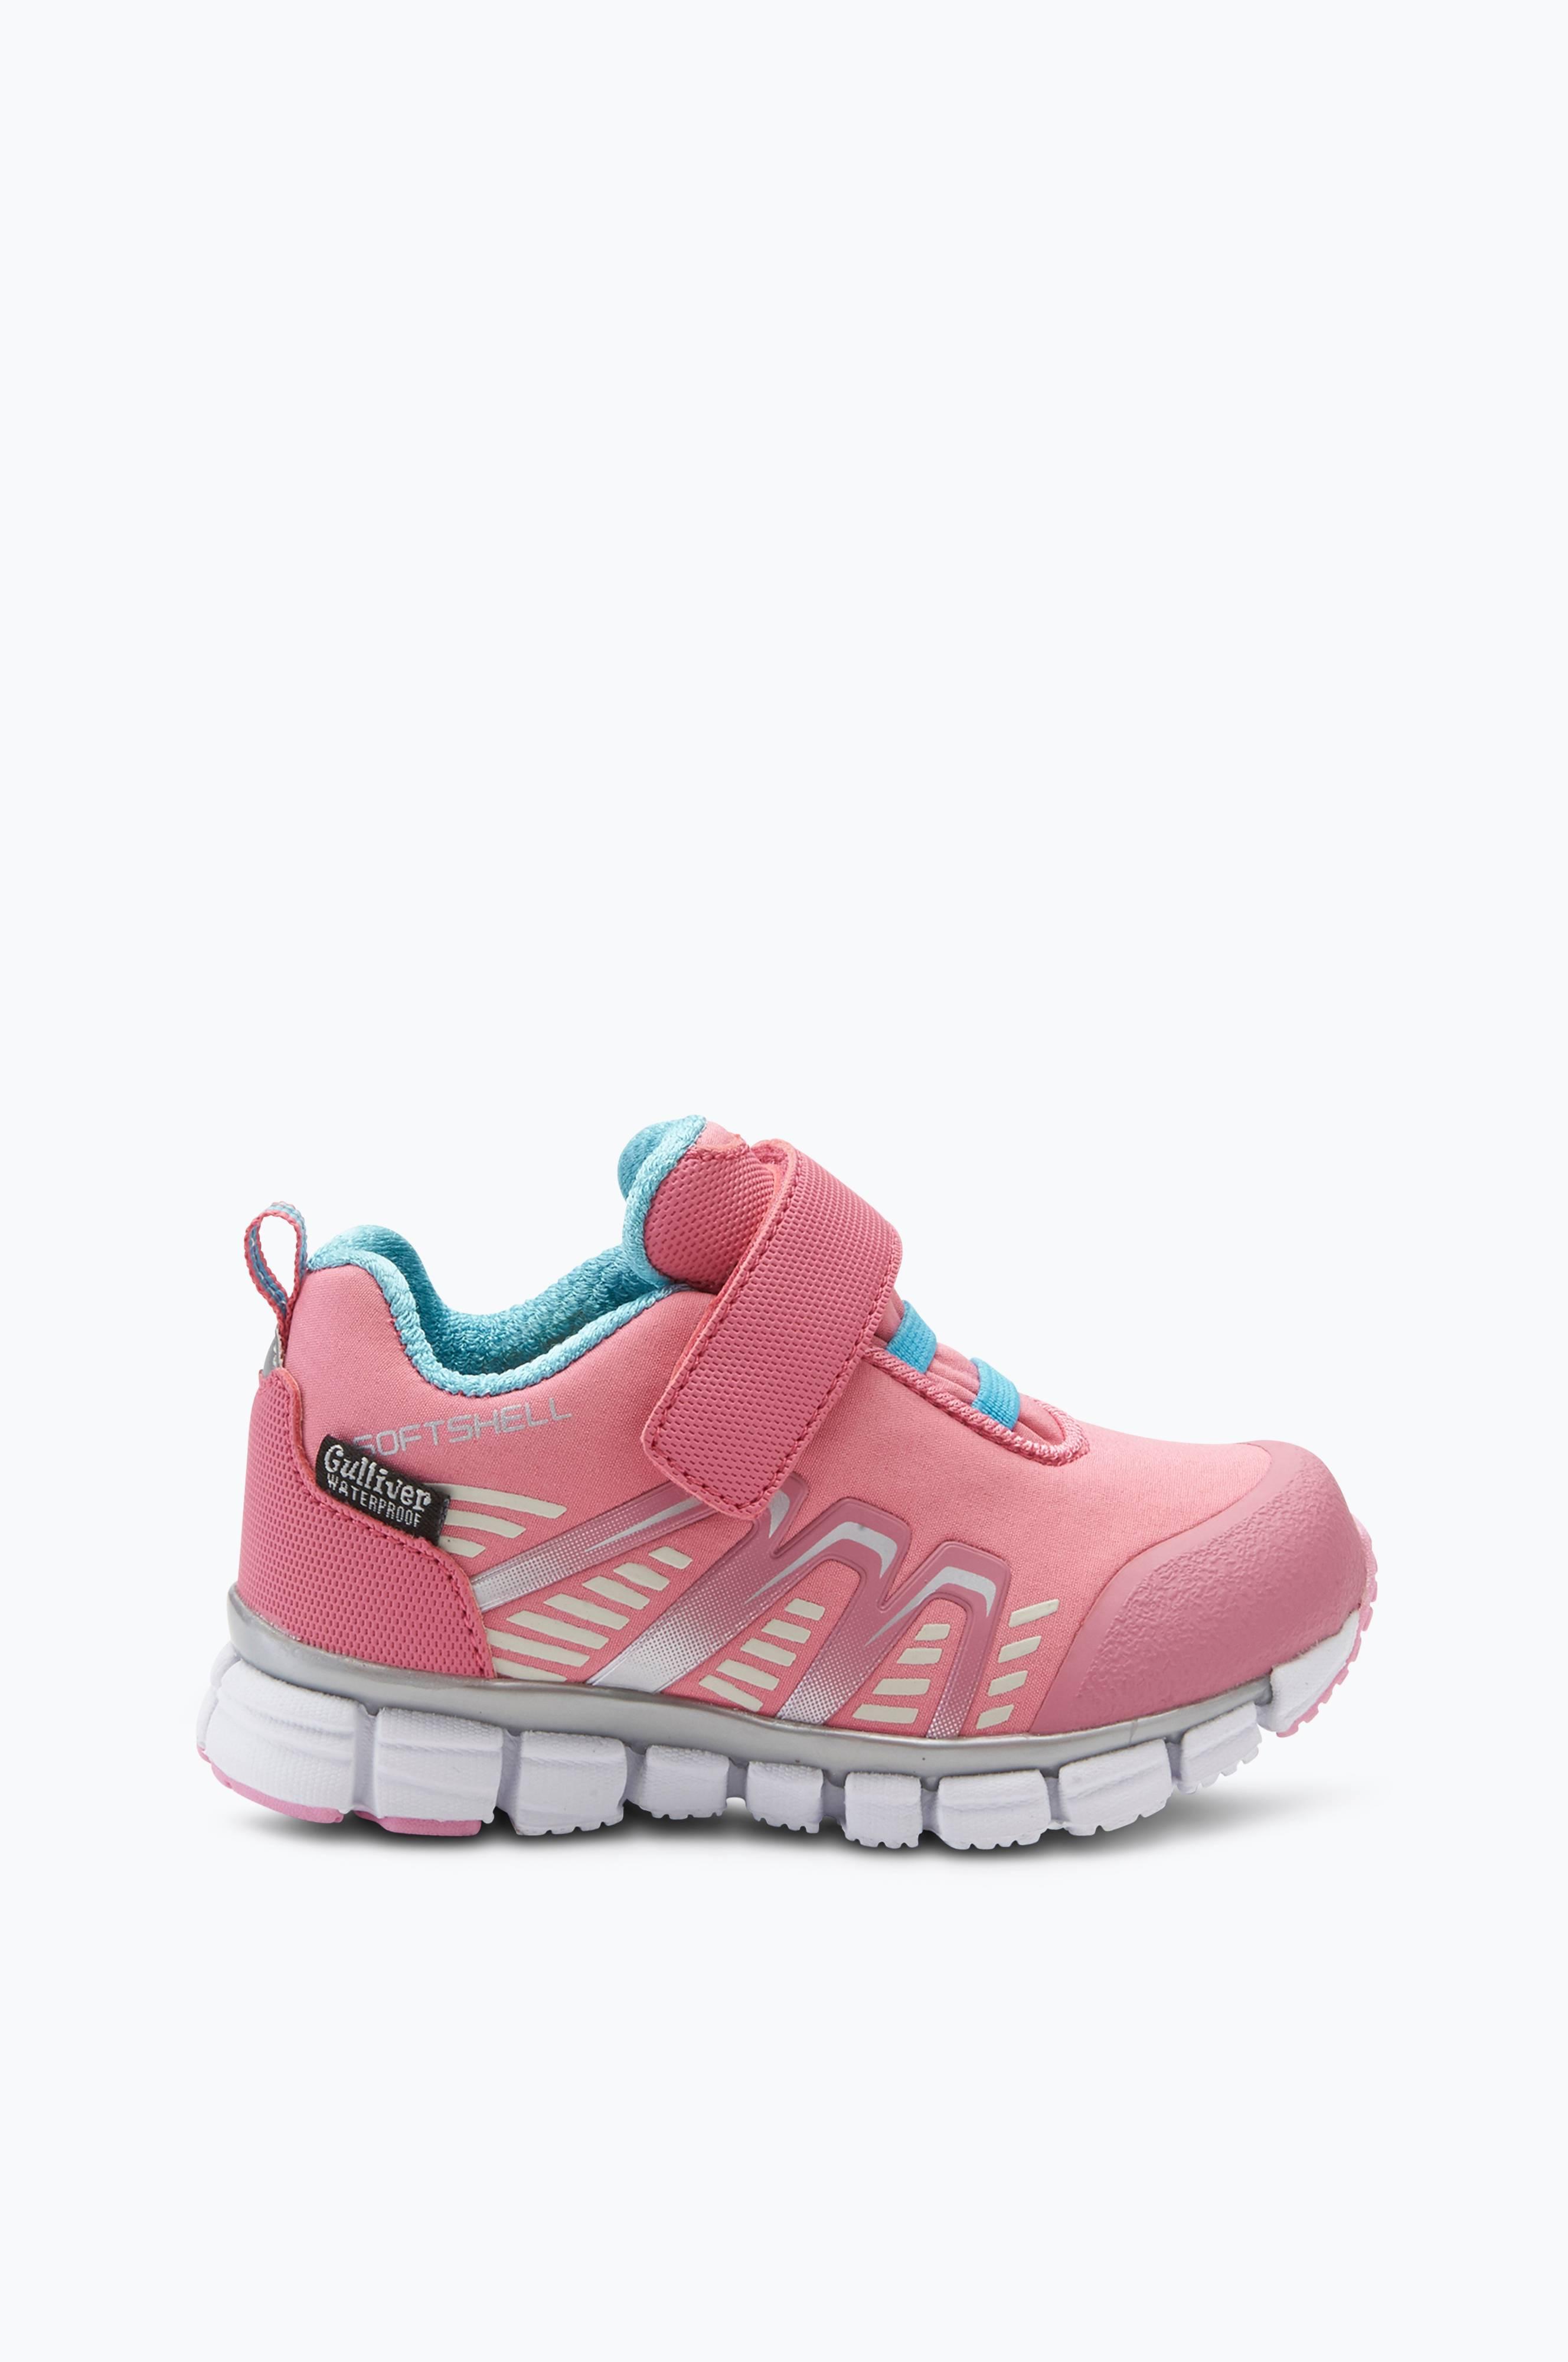 softshellvanntette i Rosa Ellos Sneakers Barn no Gulliver OiuwTZkXP